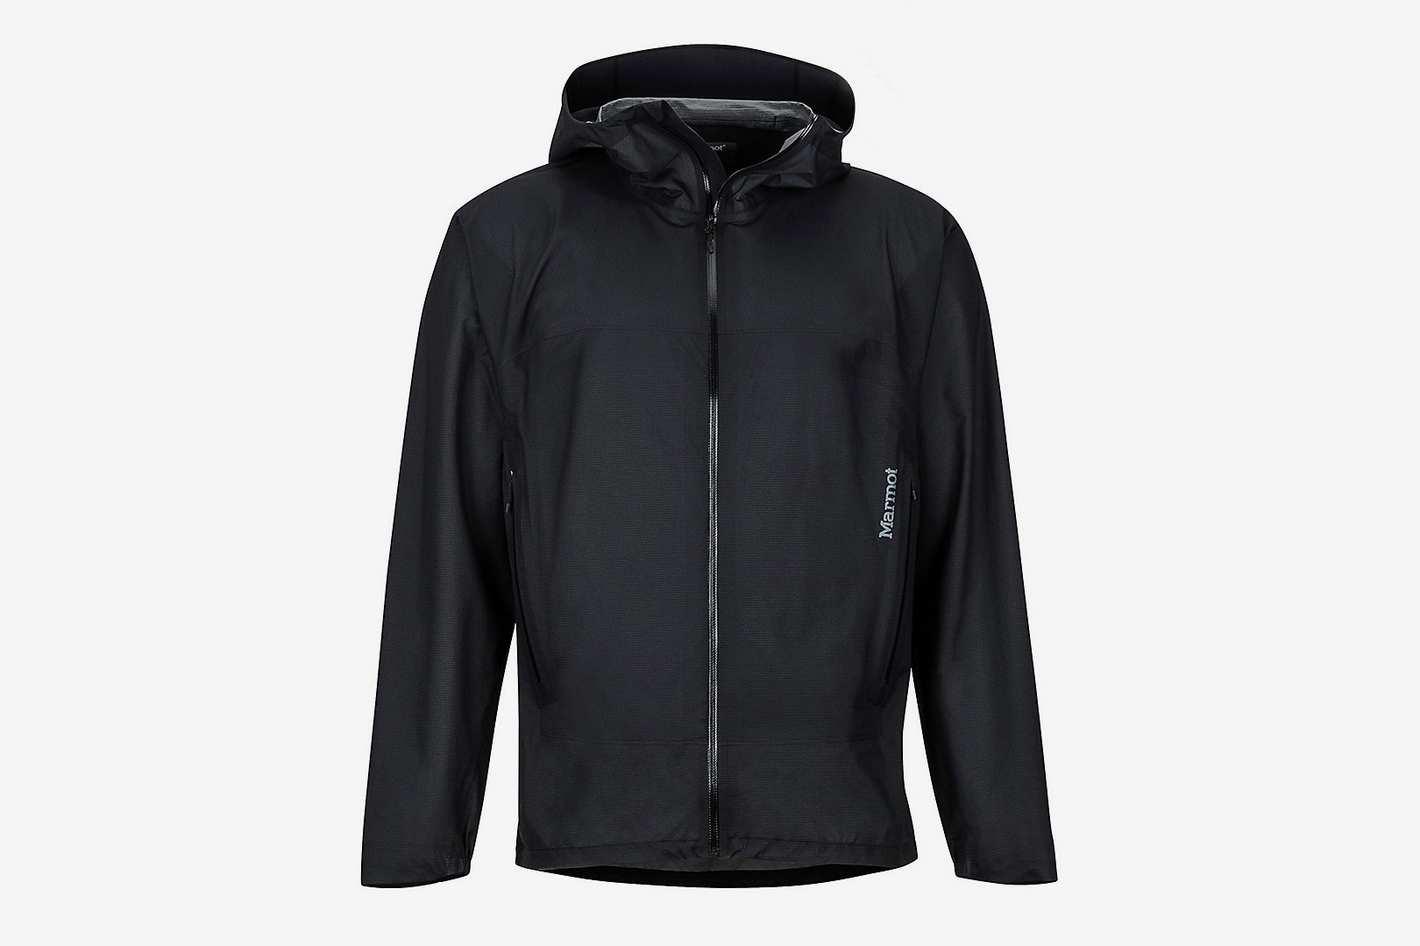 Marmot Men's Jacketweight Jacket